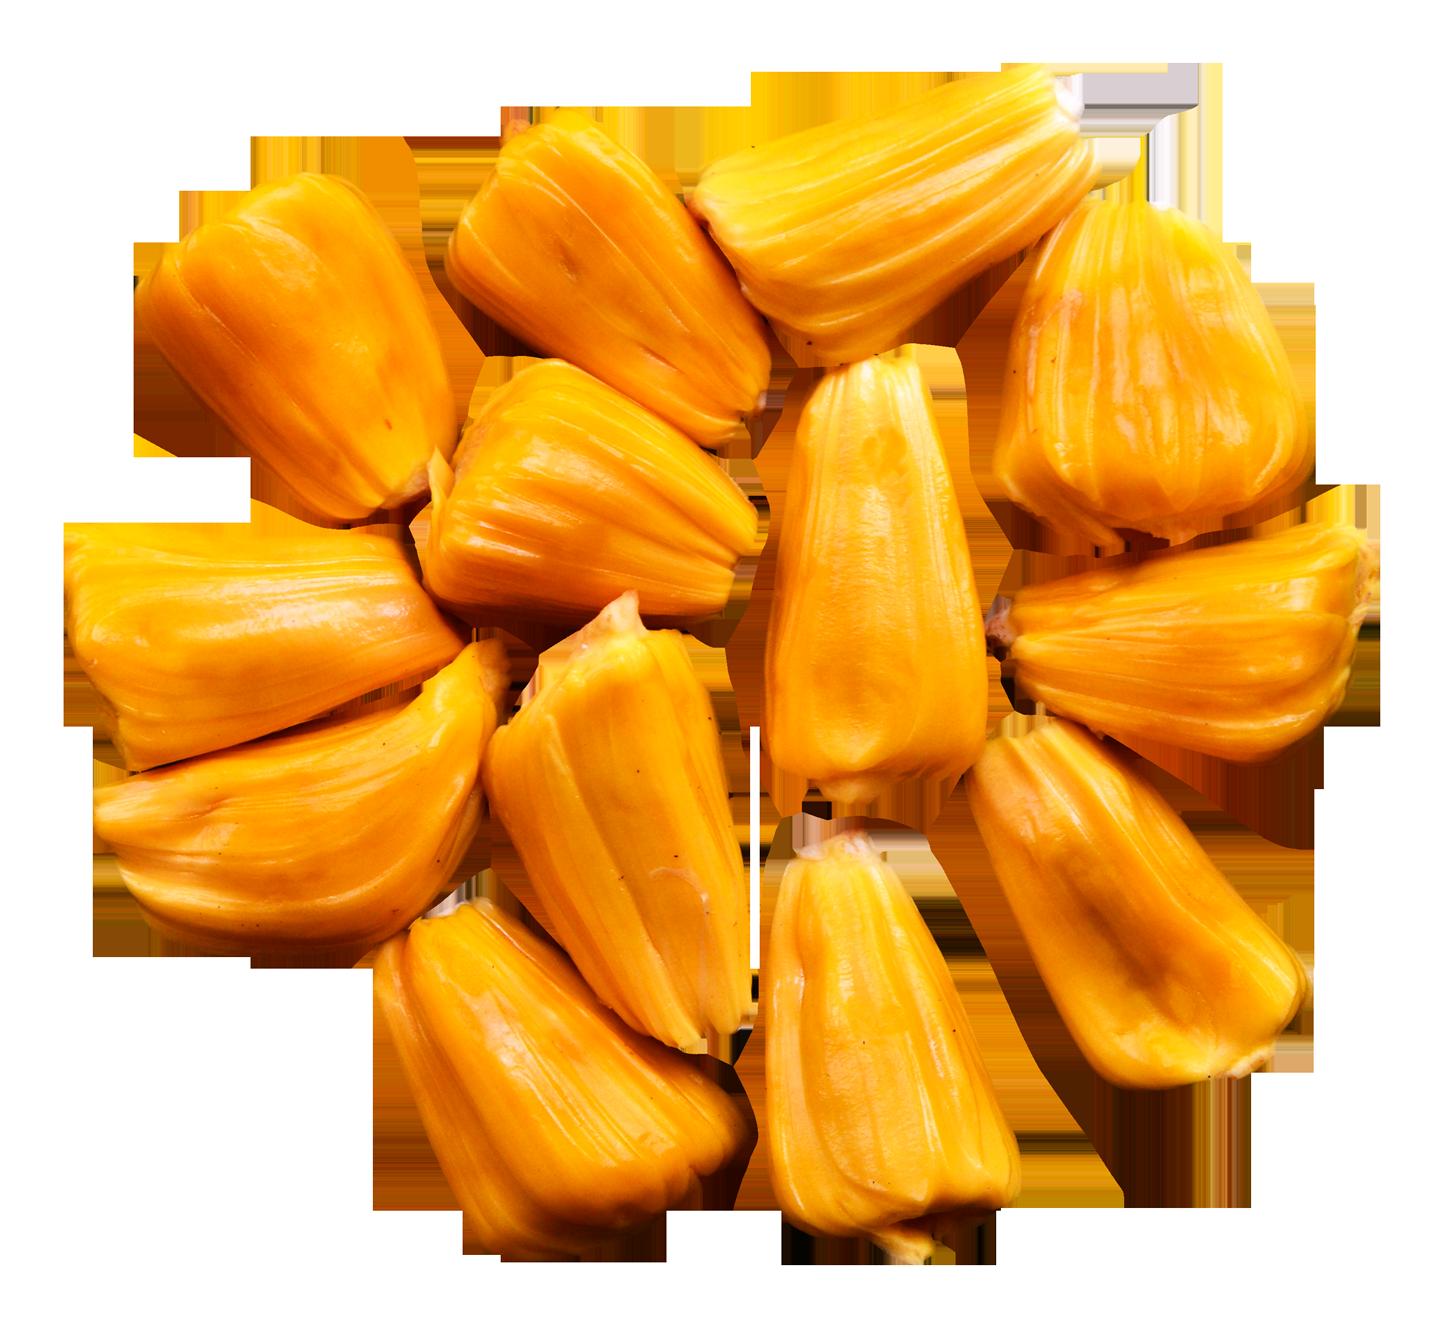 PNG Jackfruit - 70073